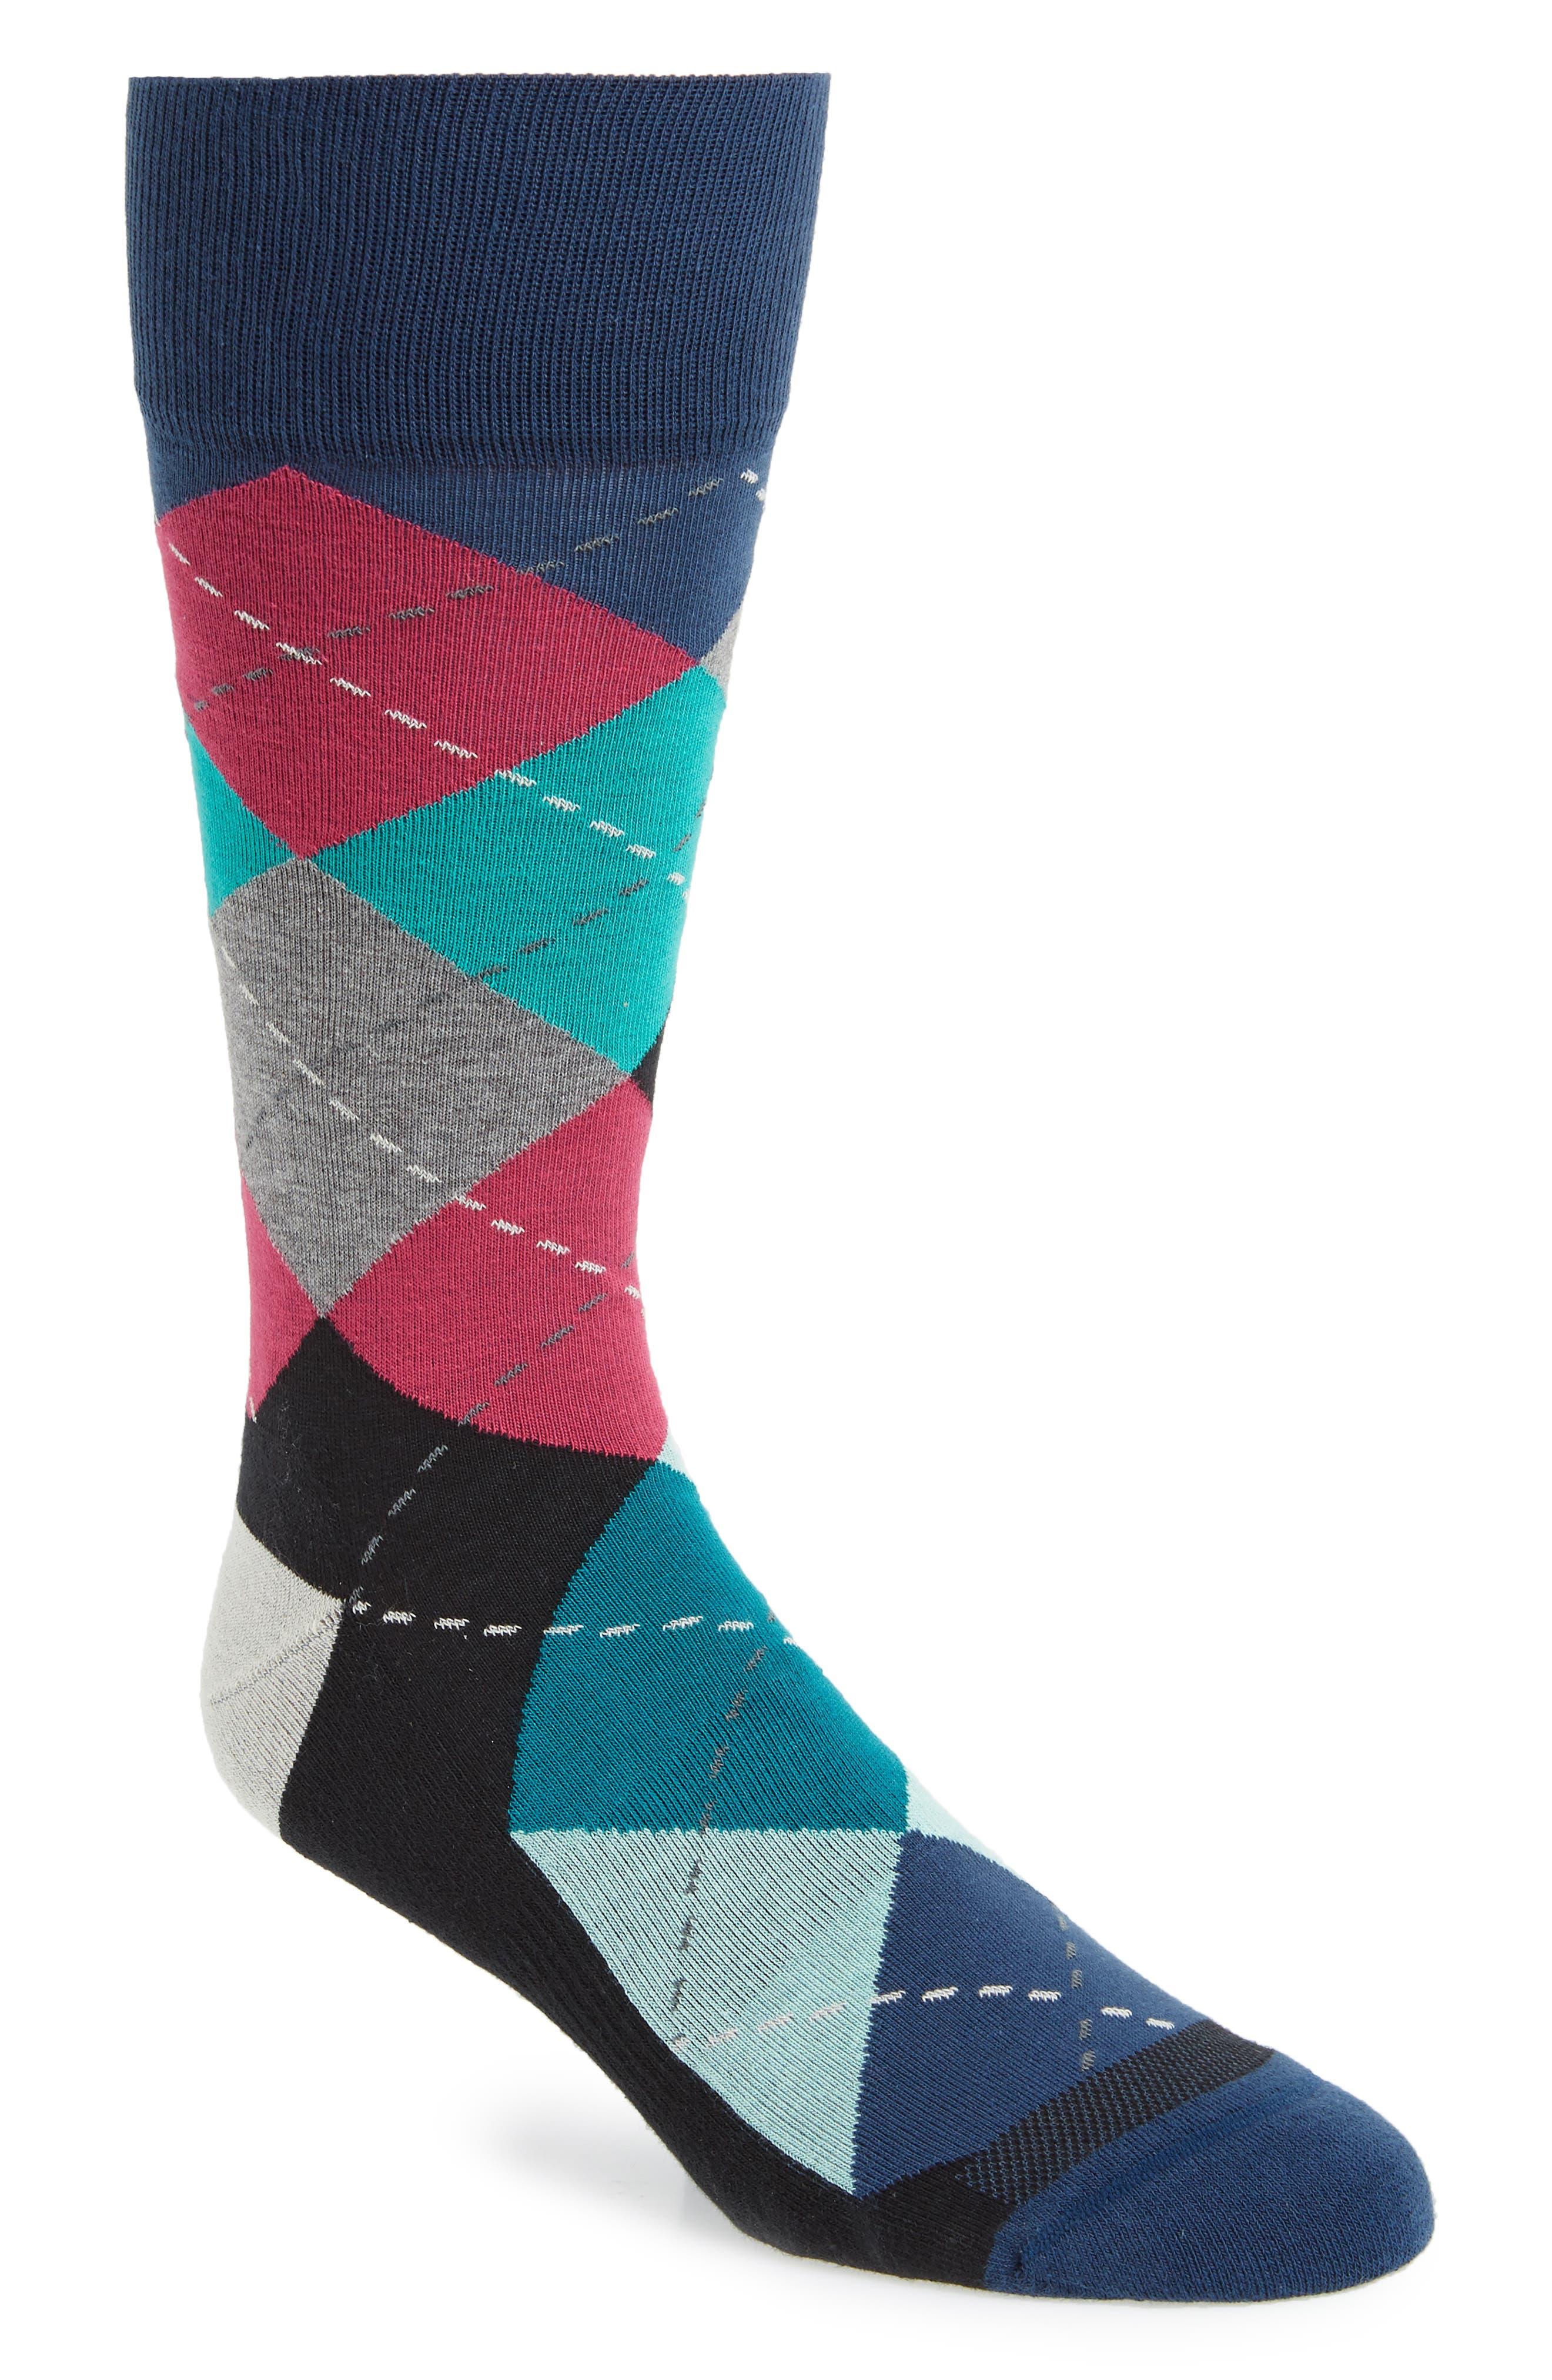 Argyle Socks,                         Main,                         color, Navy/ Red